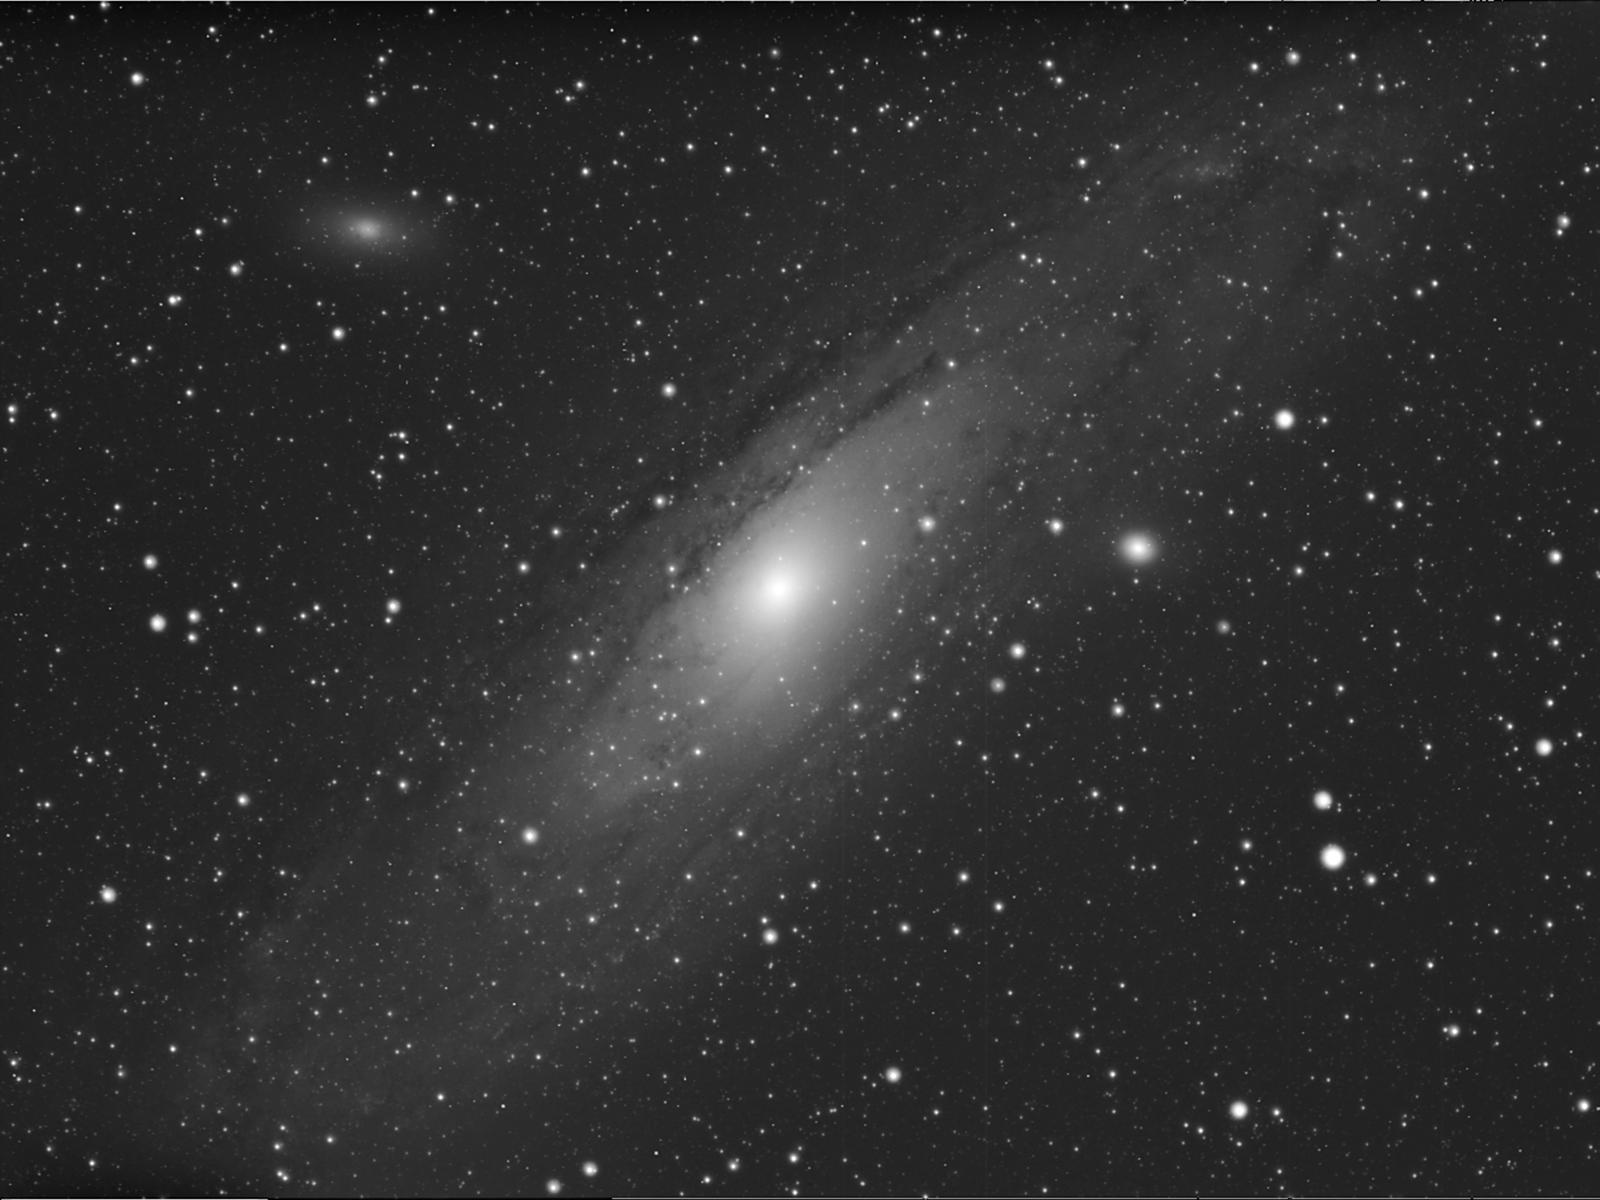 M31-Winter_bw.jpg.280967641eb34d381dafaf16e892edae.jpg